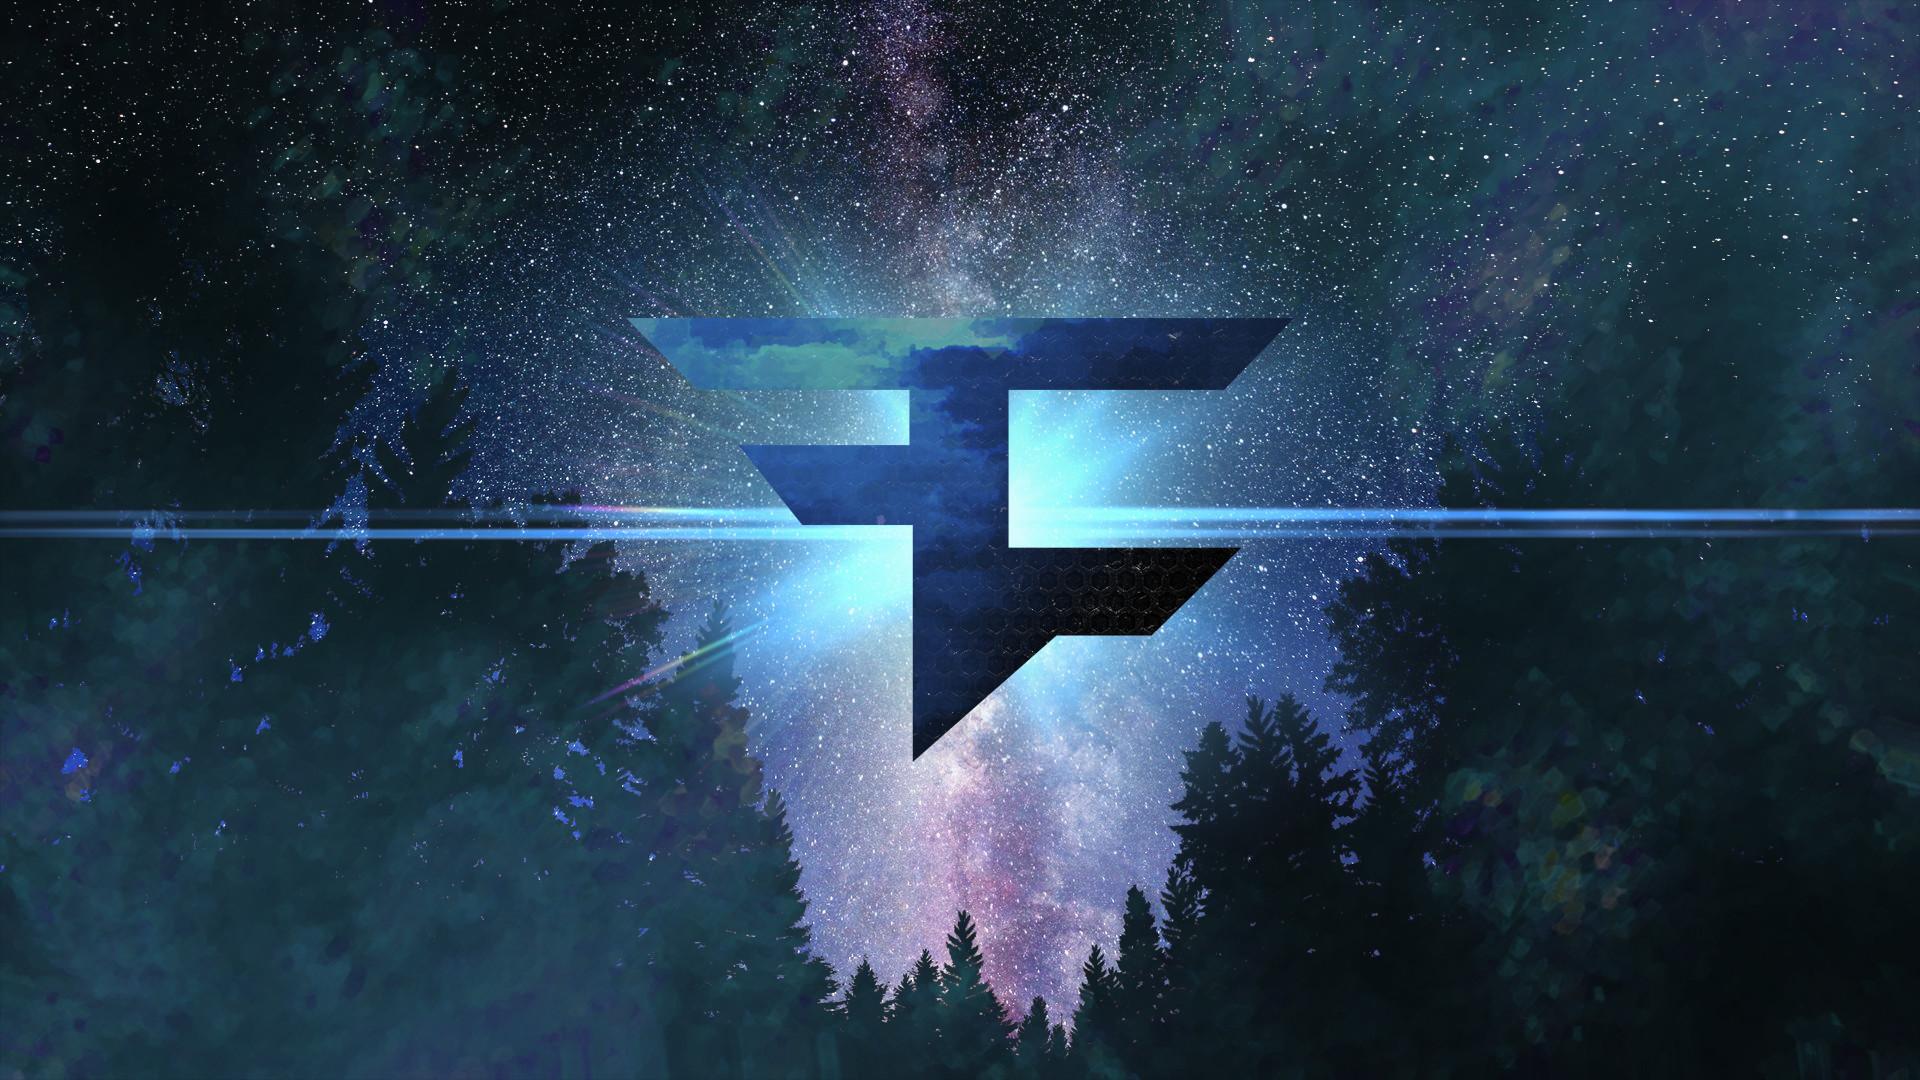 FaZe wallpaper galaxy edition! by FearFoxDesigns FaZe wallpaper galaxy  edition! by FearFoxDesigns